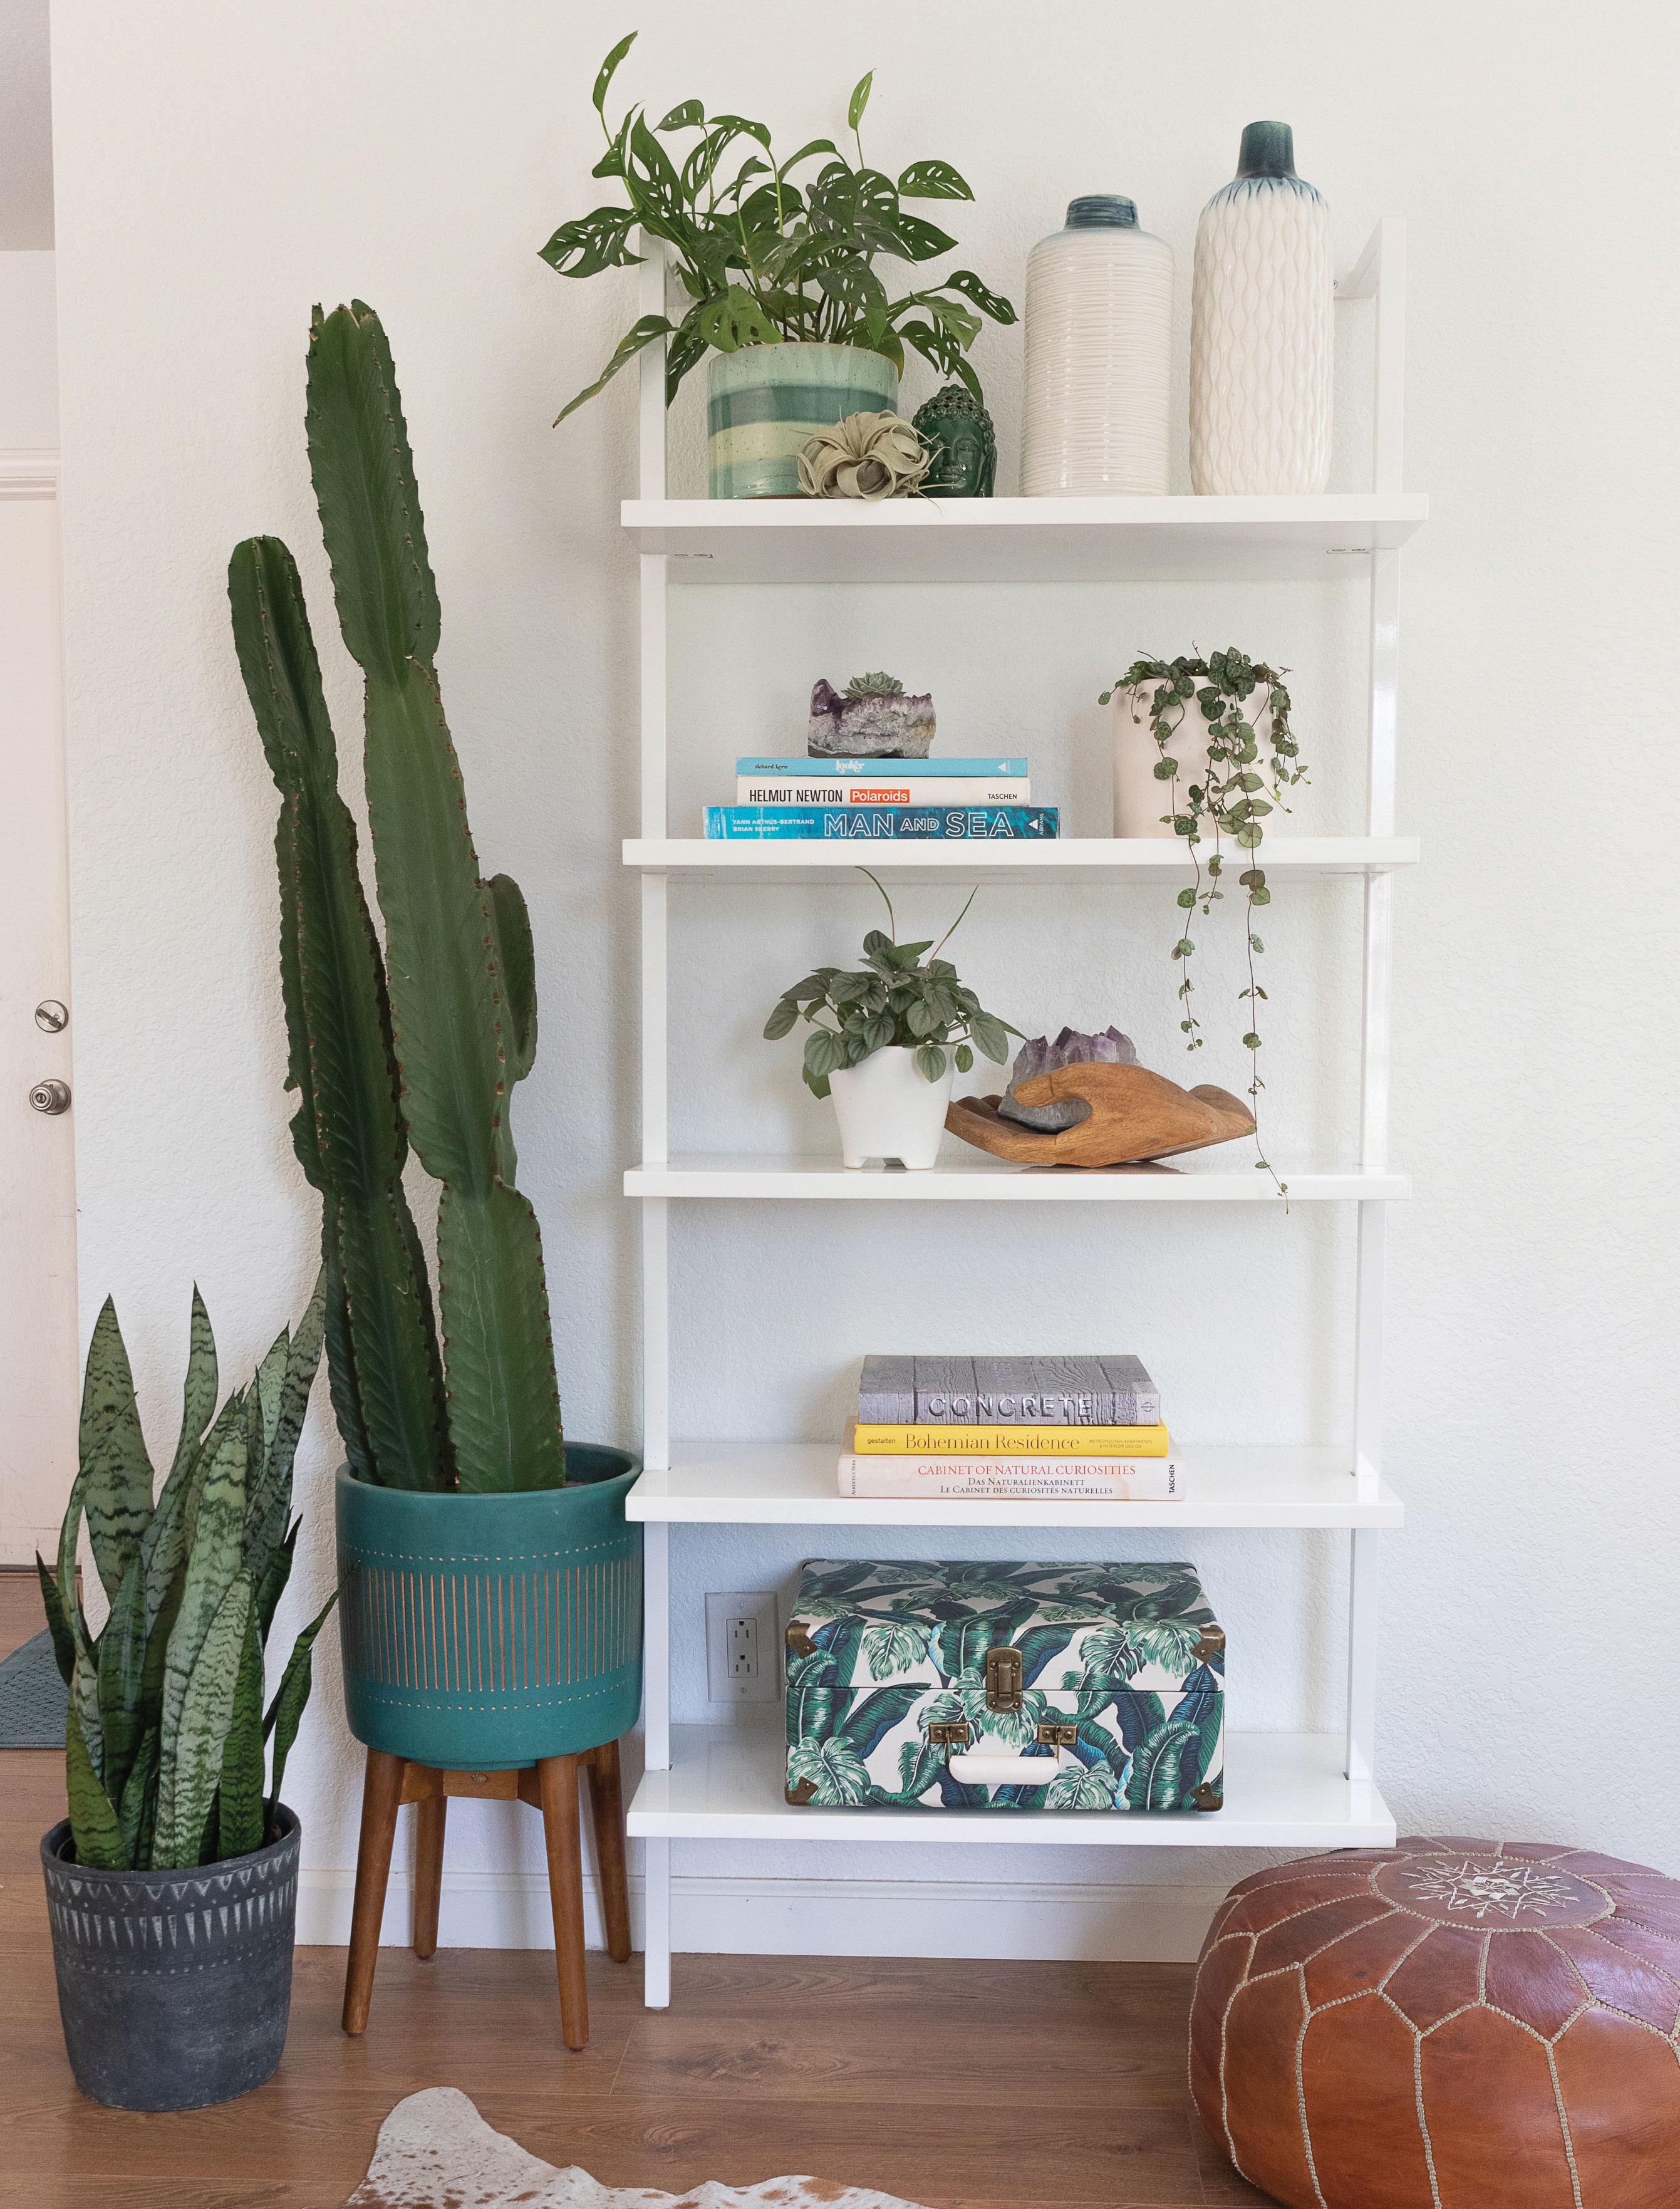 houseplants indoor plants bookshelf